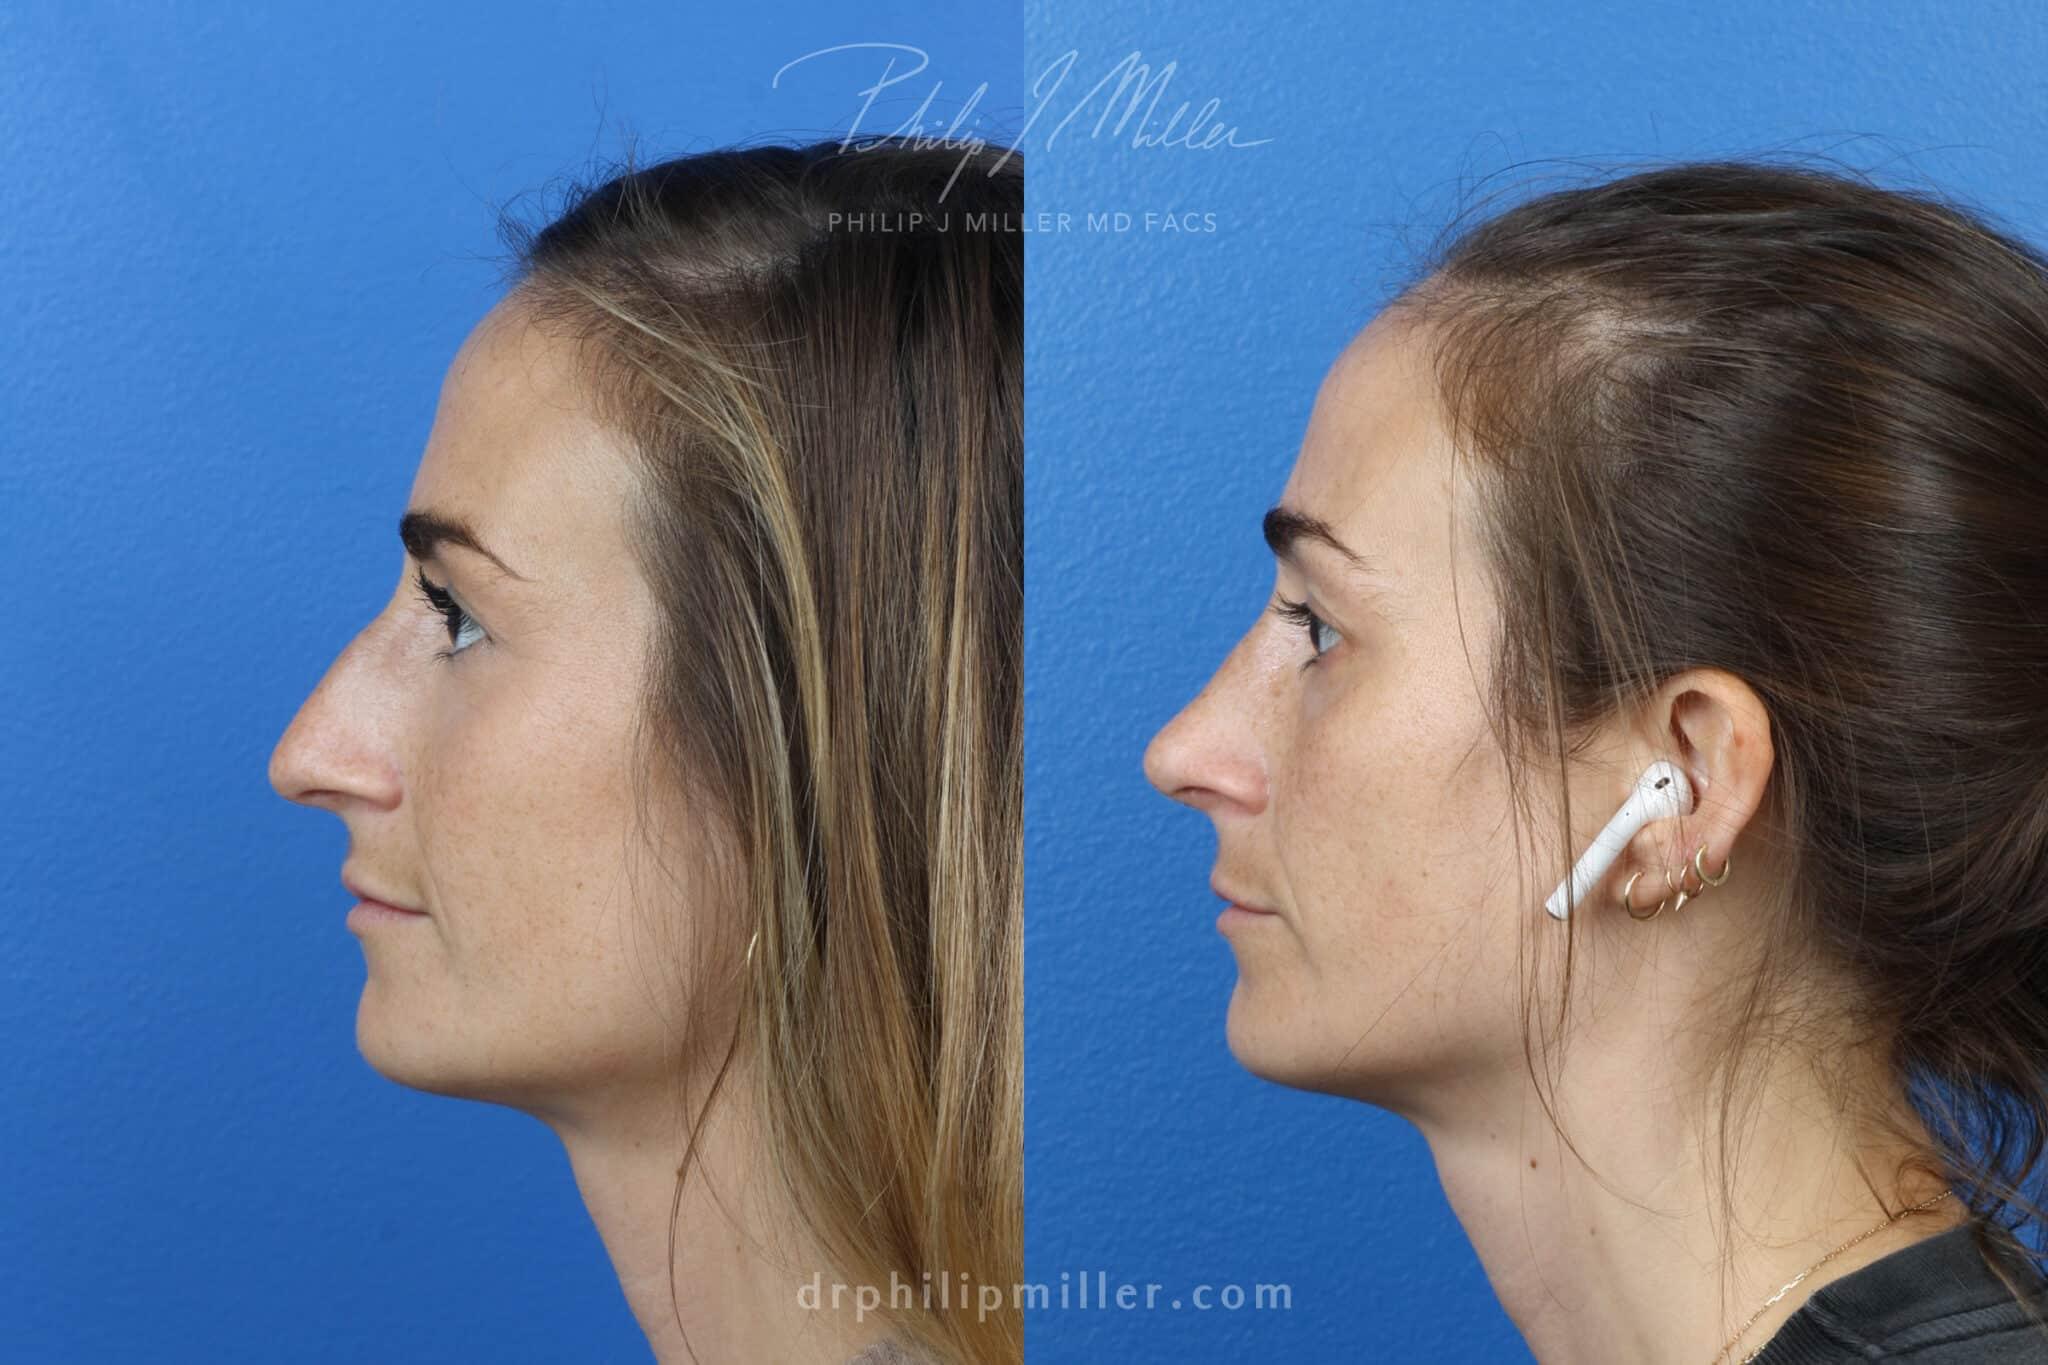 Rhinoplasty Left to correct nasal bridge female Miller